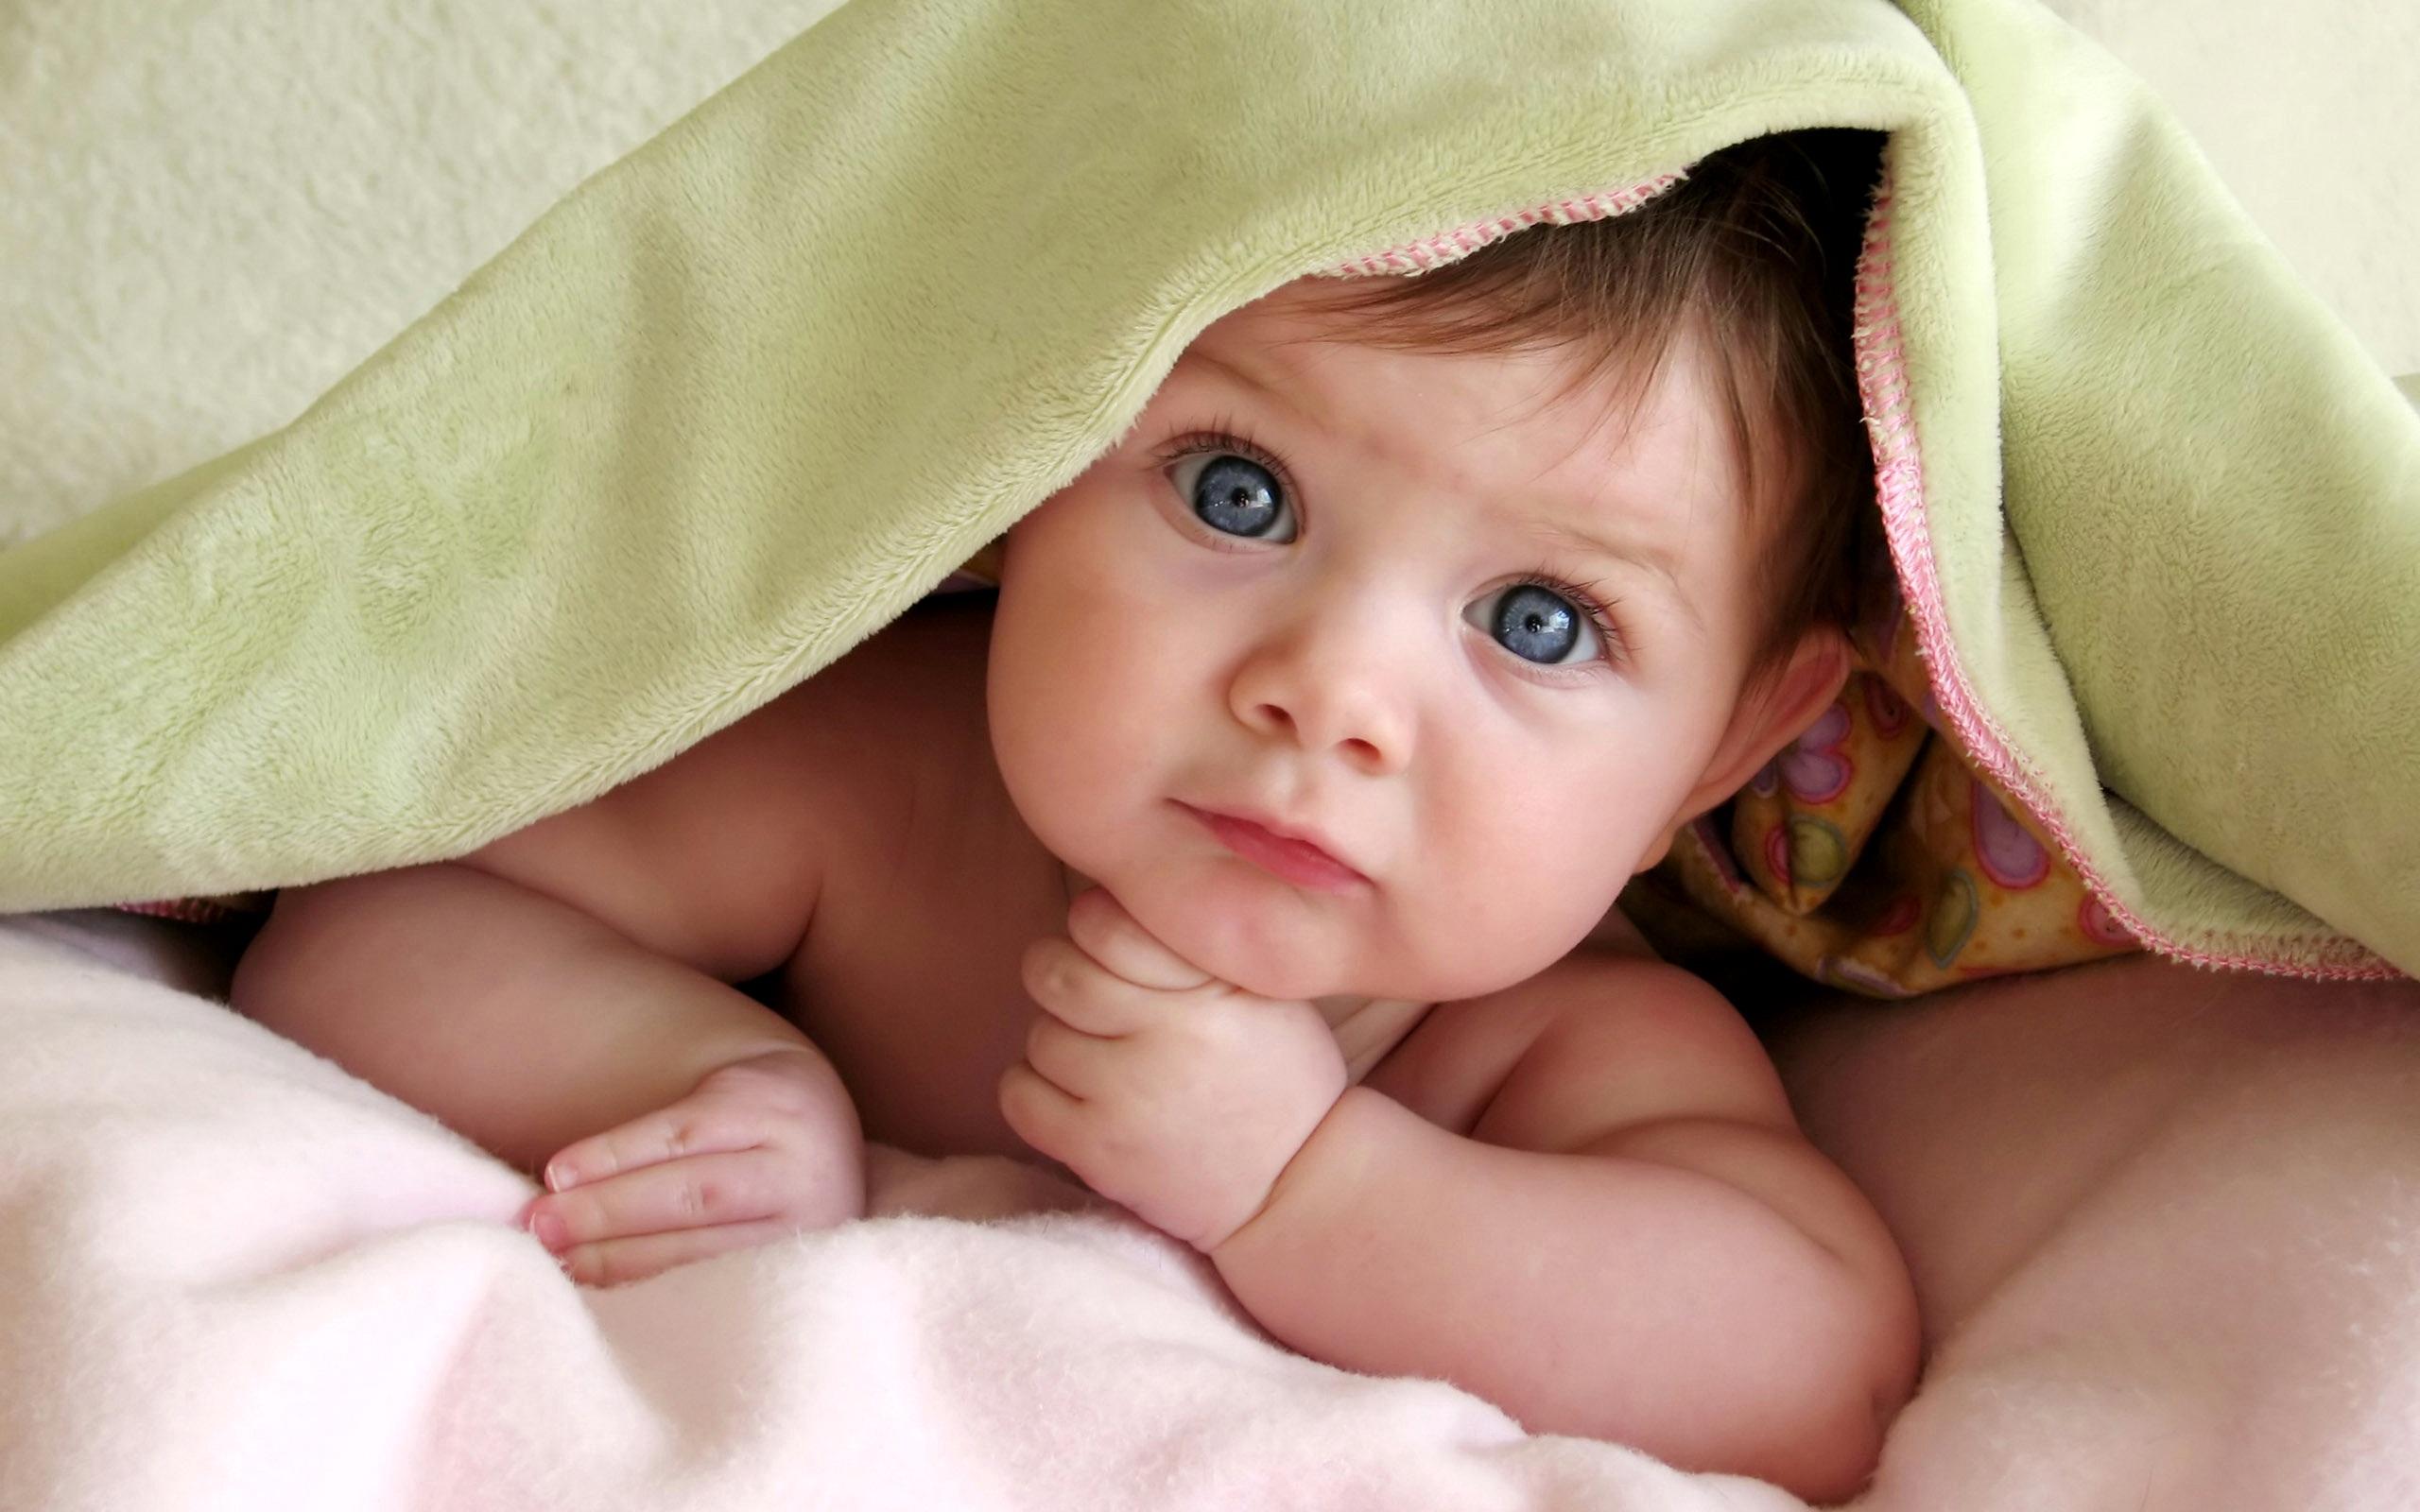 Cute Baby Starring